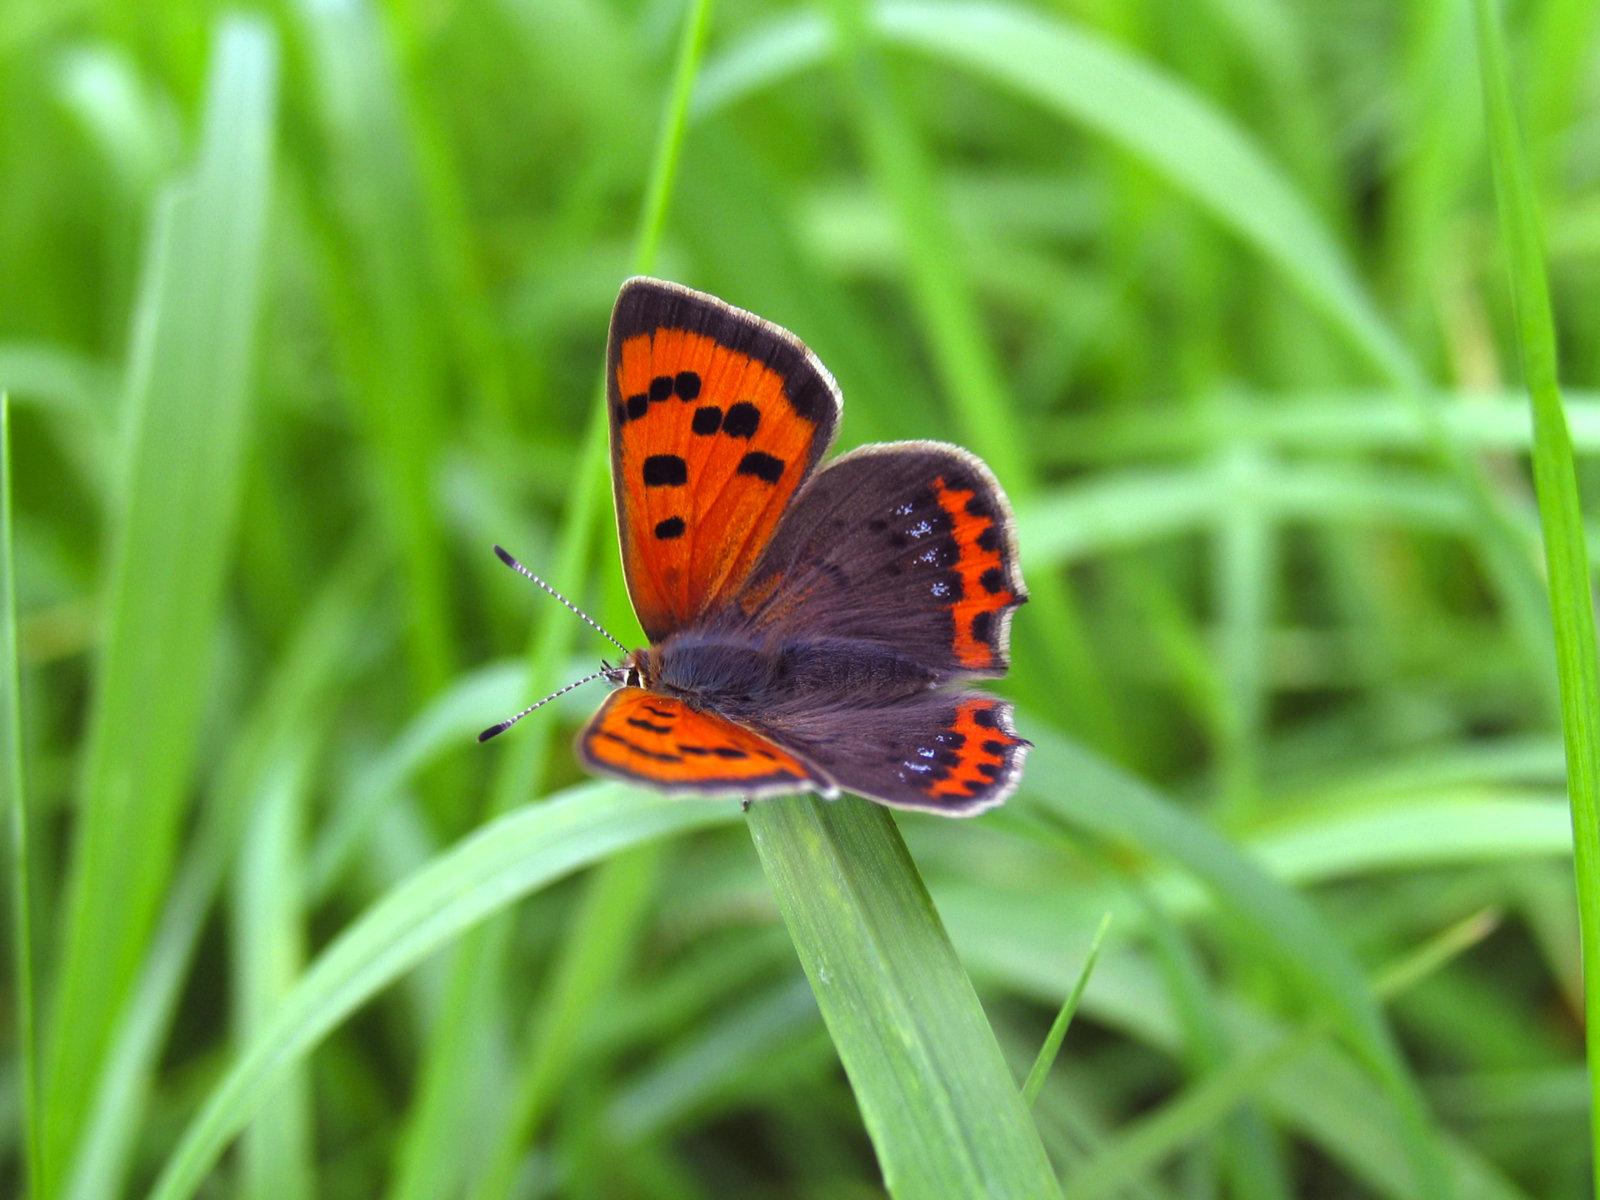 Lille ildfugl, Lycaena phlaeas